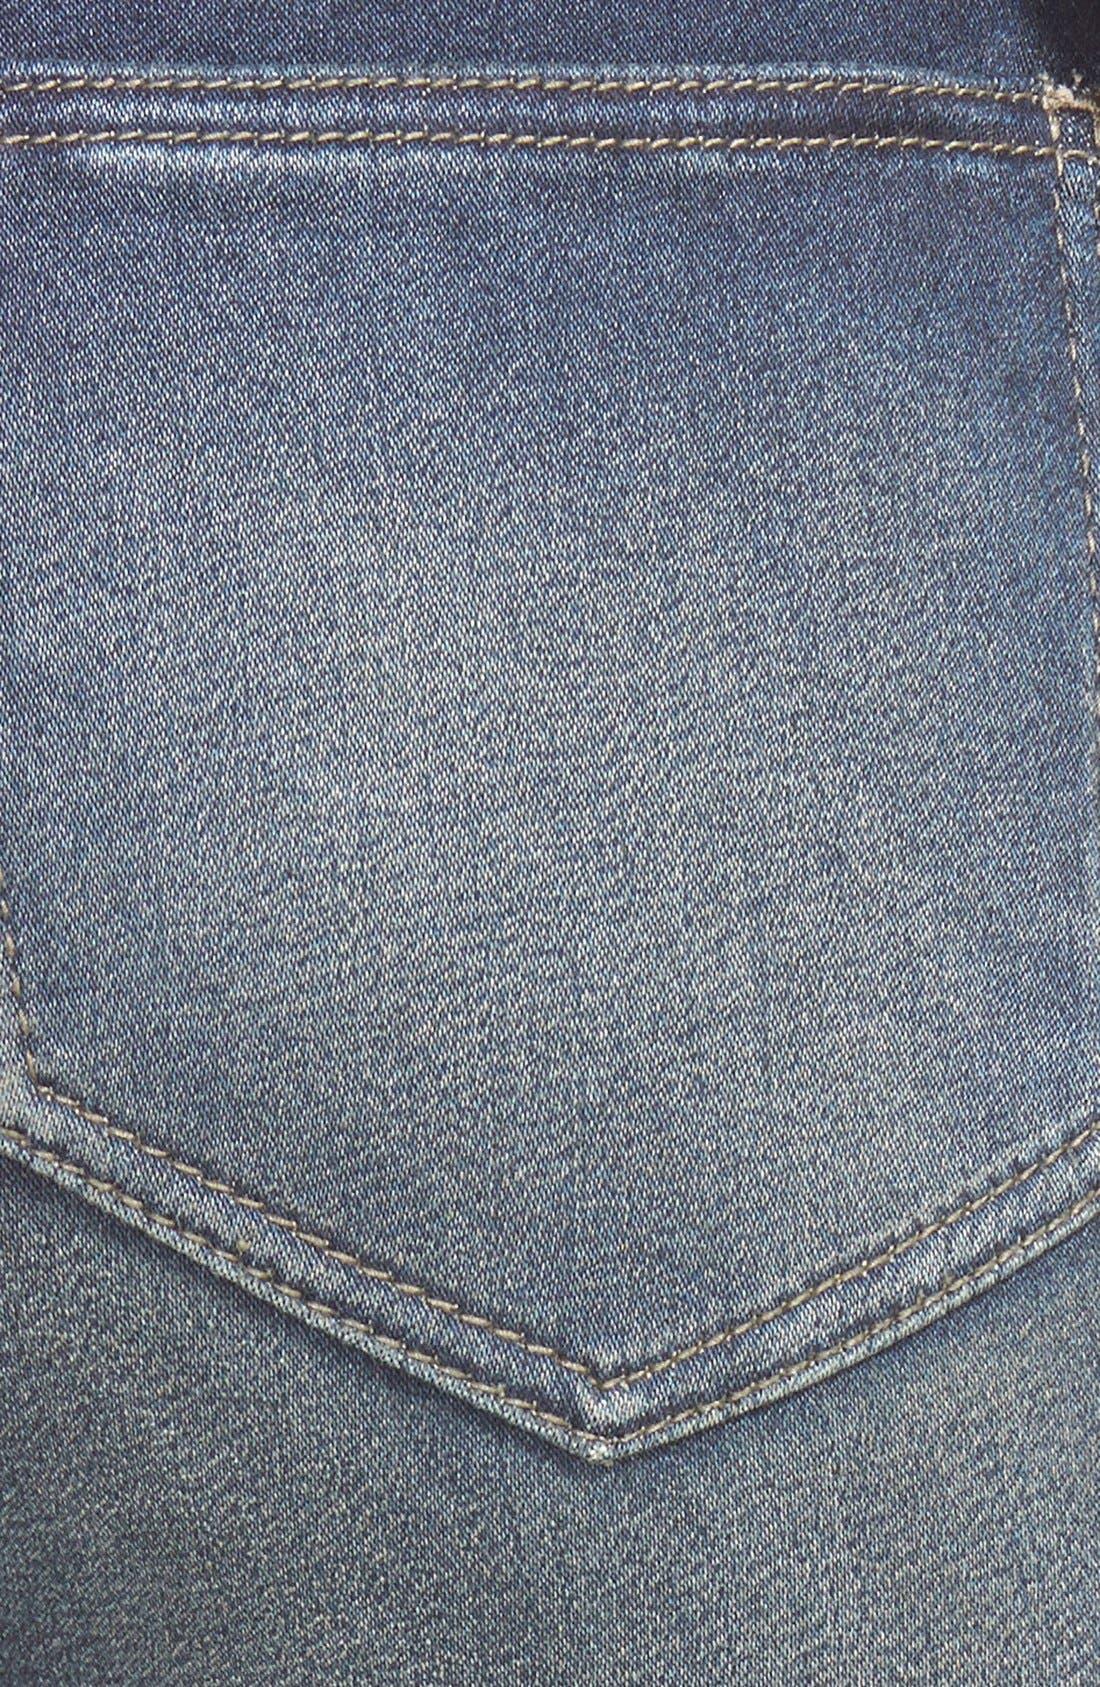 Alternate Image 3  - Generra High Waist Skinny Jeans